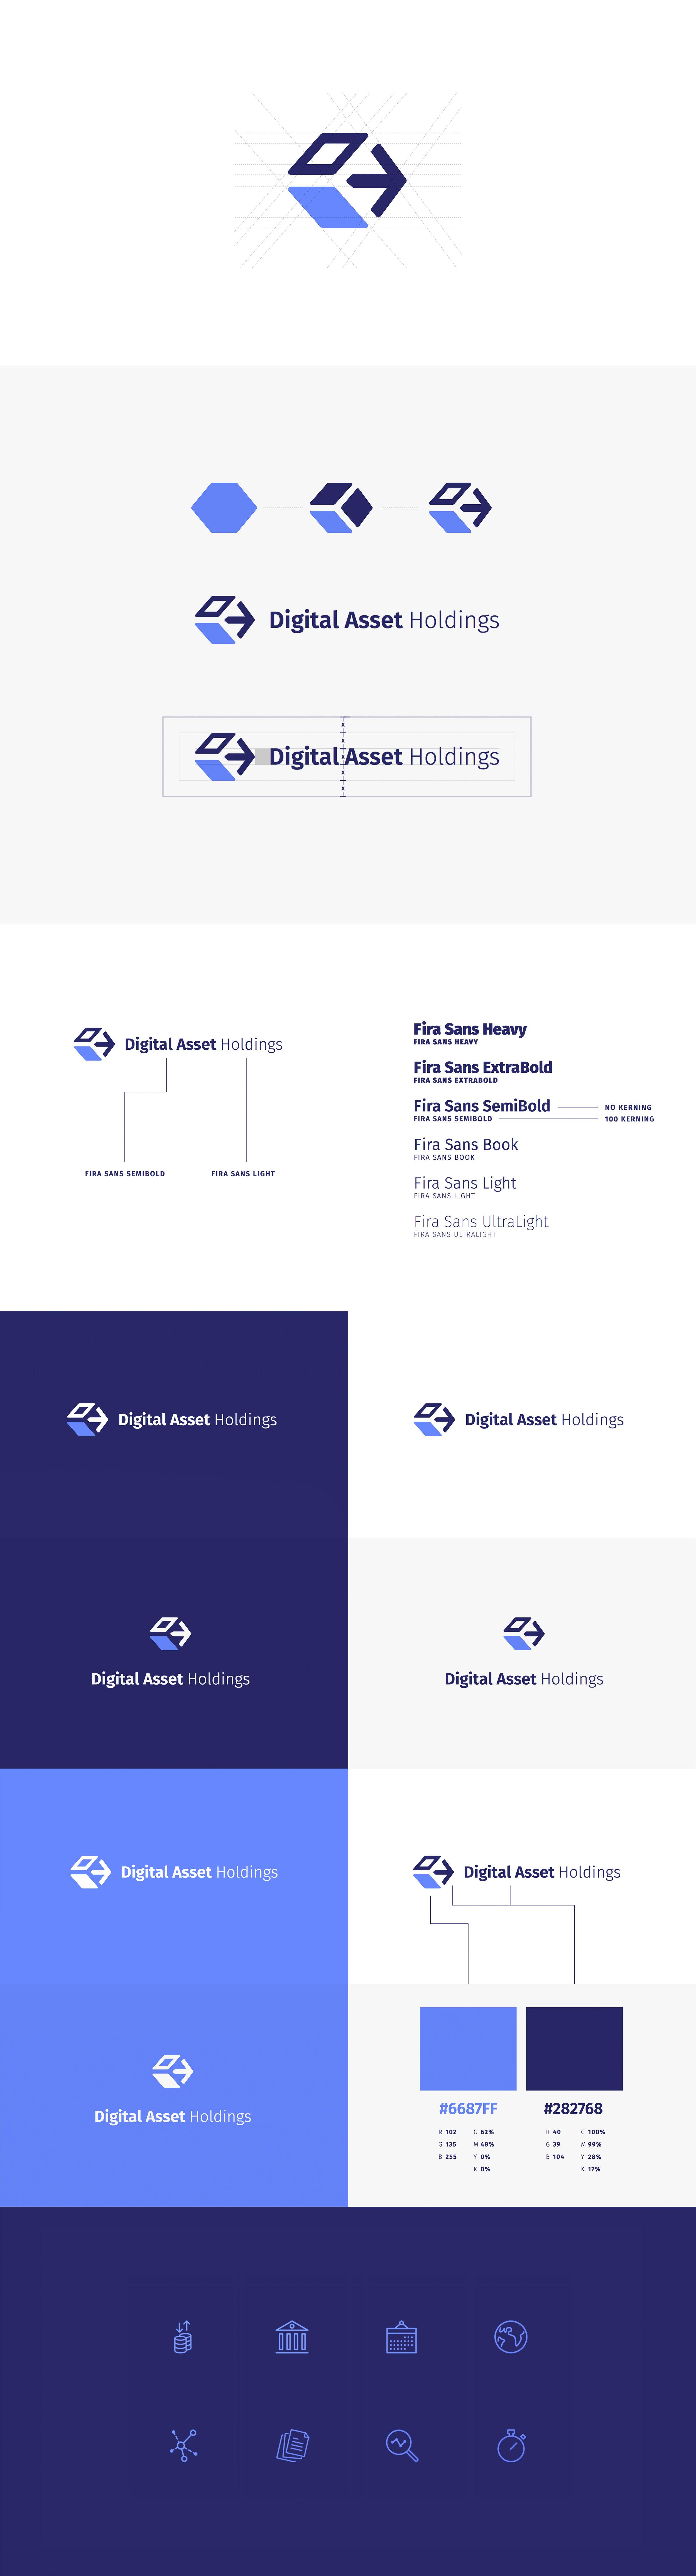 WBCG_DigitalAsset_Logo2.jpg